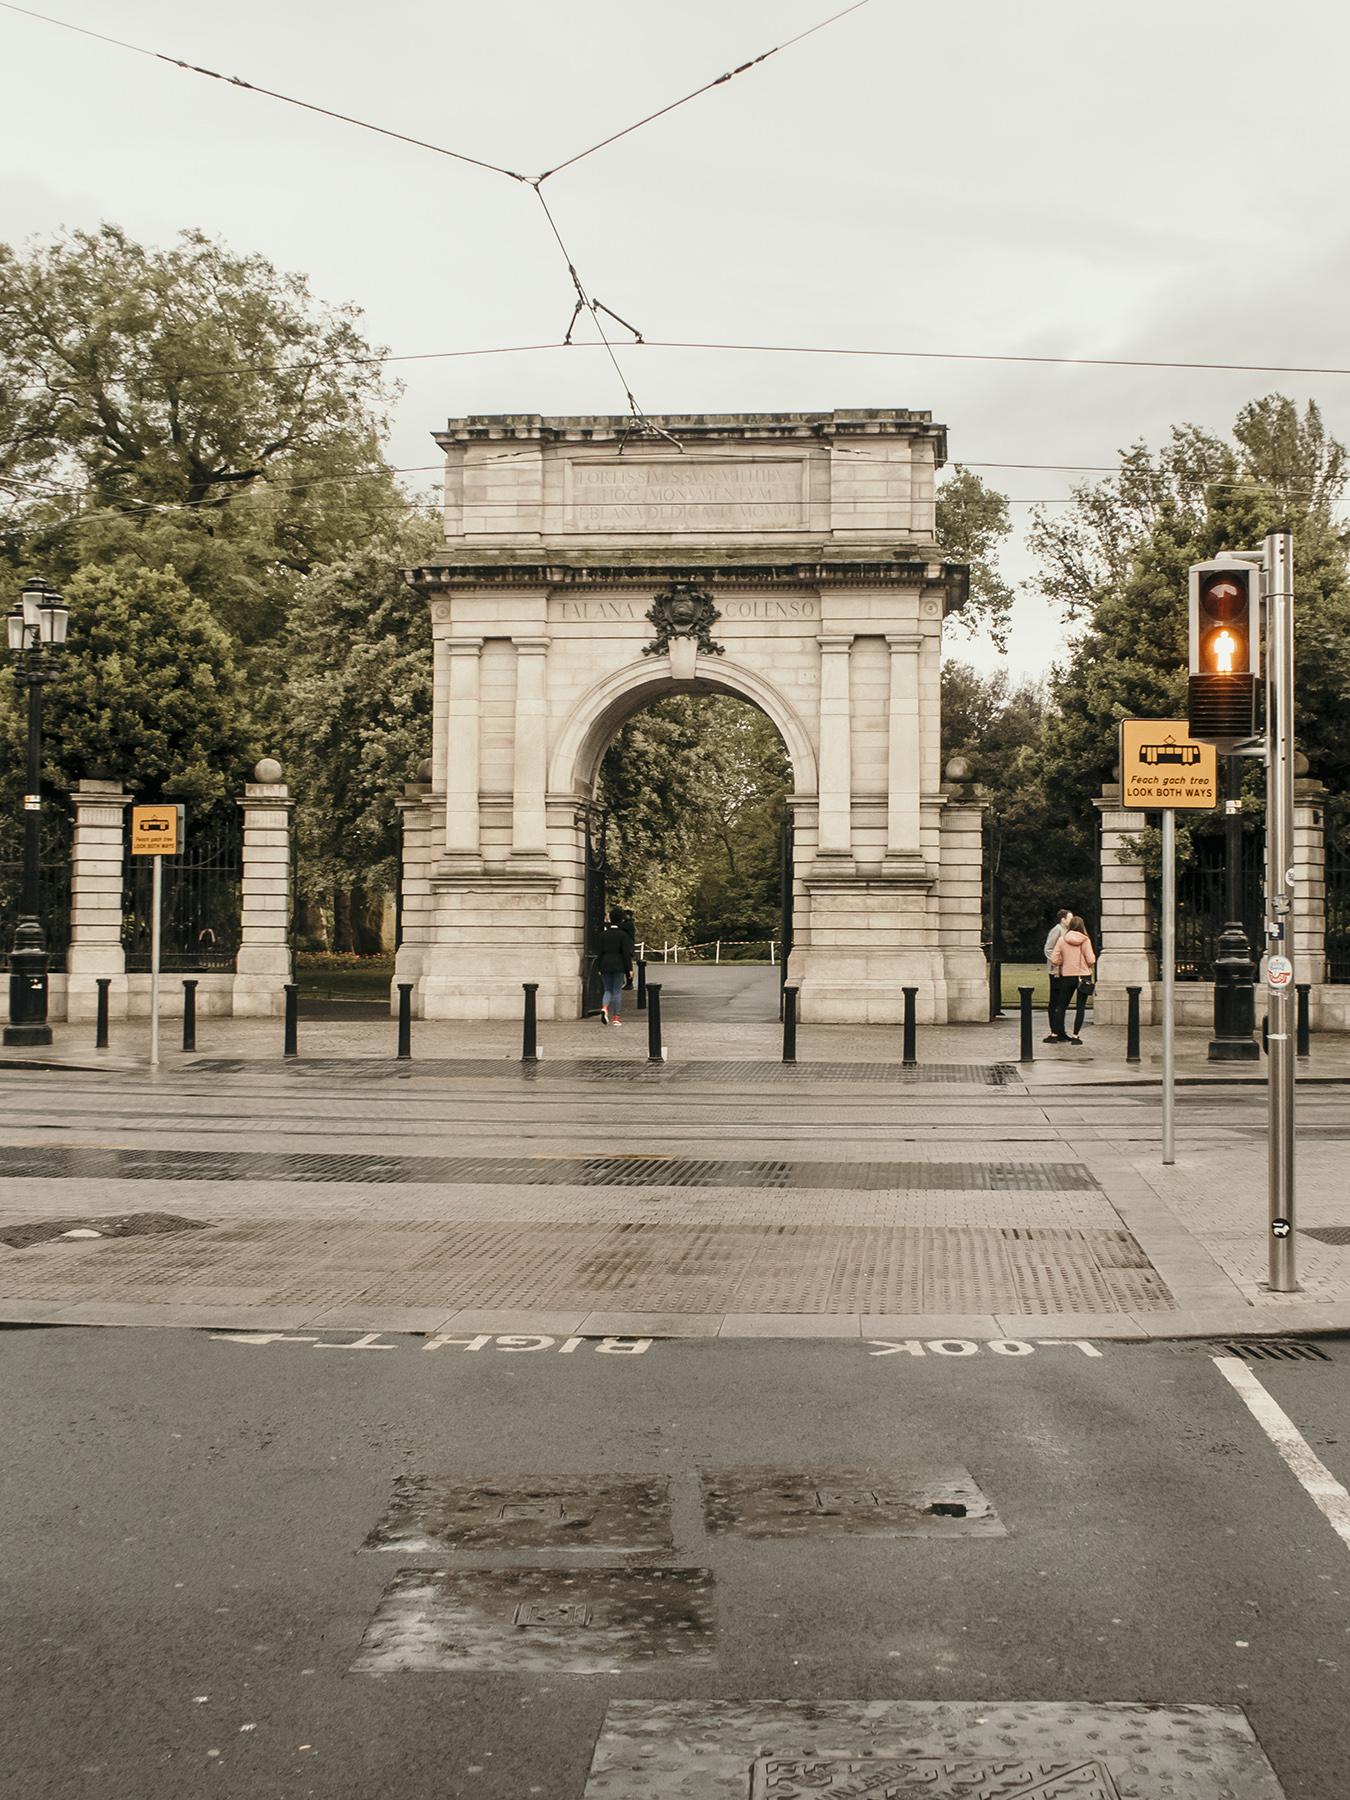 St Stephen's Green Park entrance